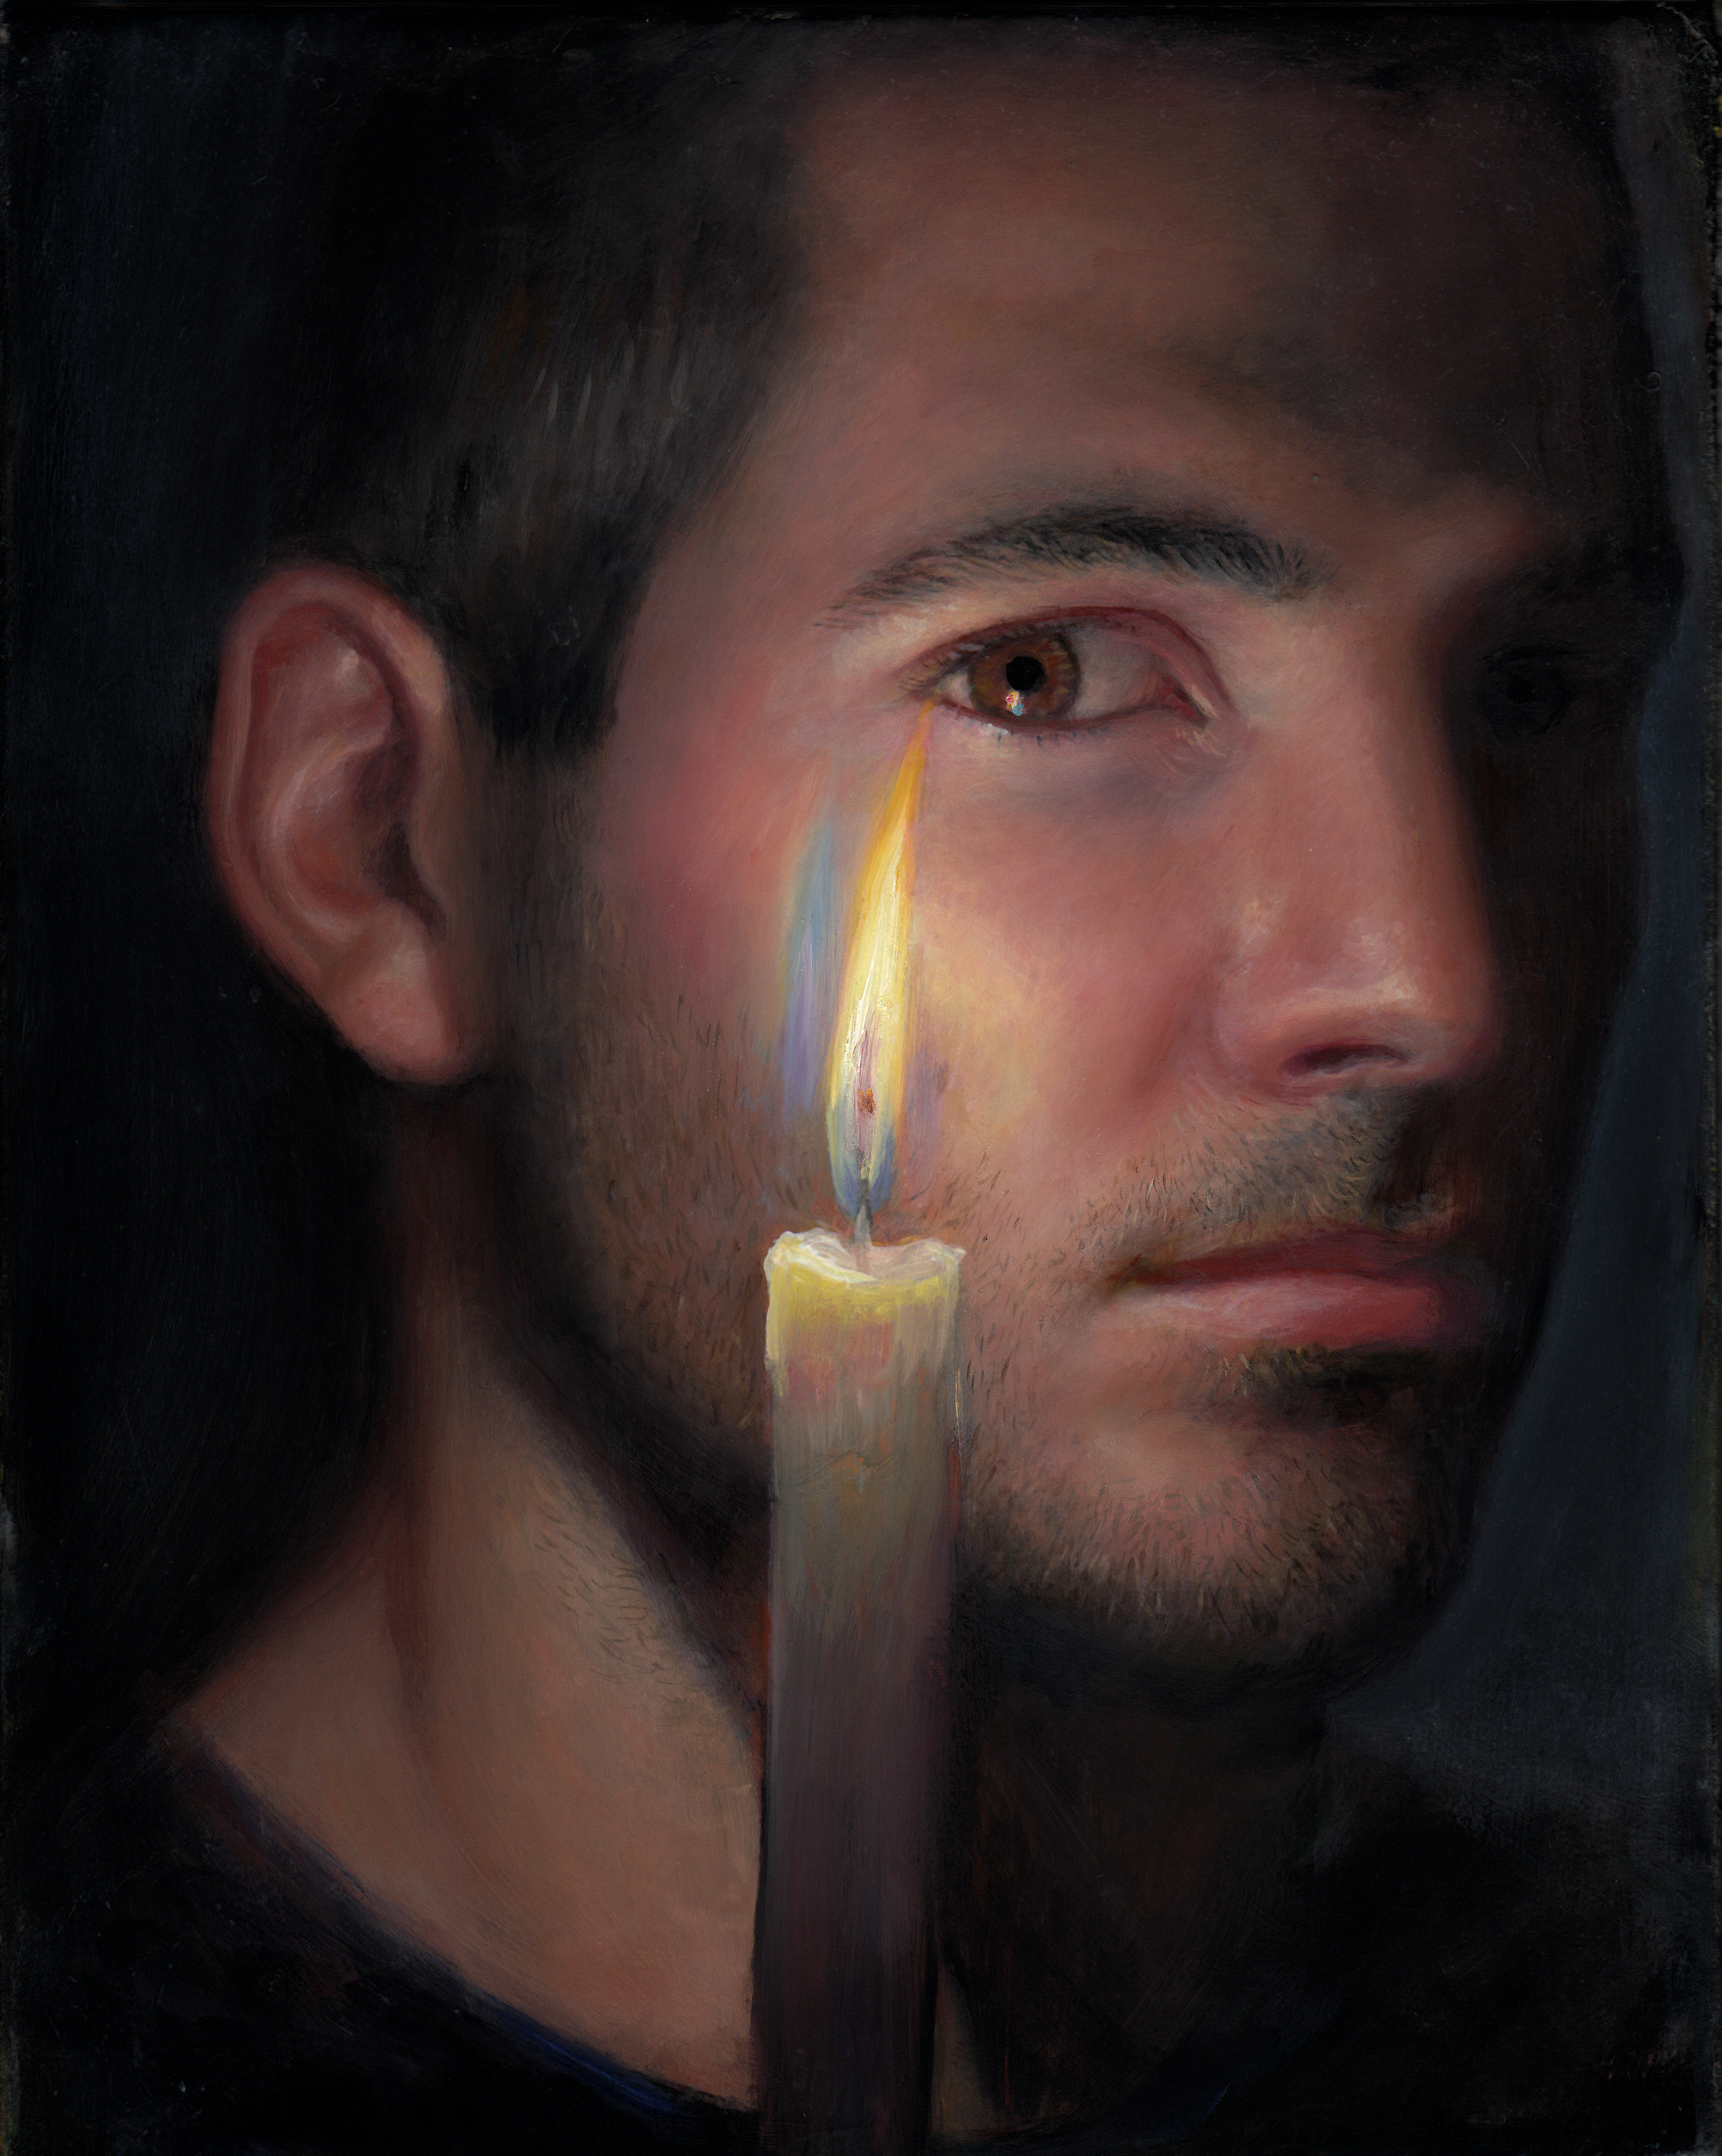 tm davy, candela (self), 10x8 inches, oil on linen, 2013-hero